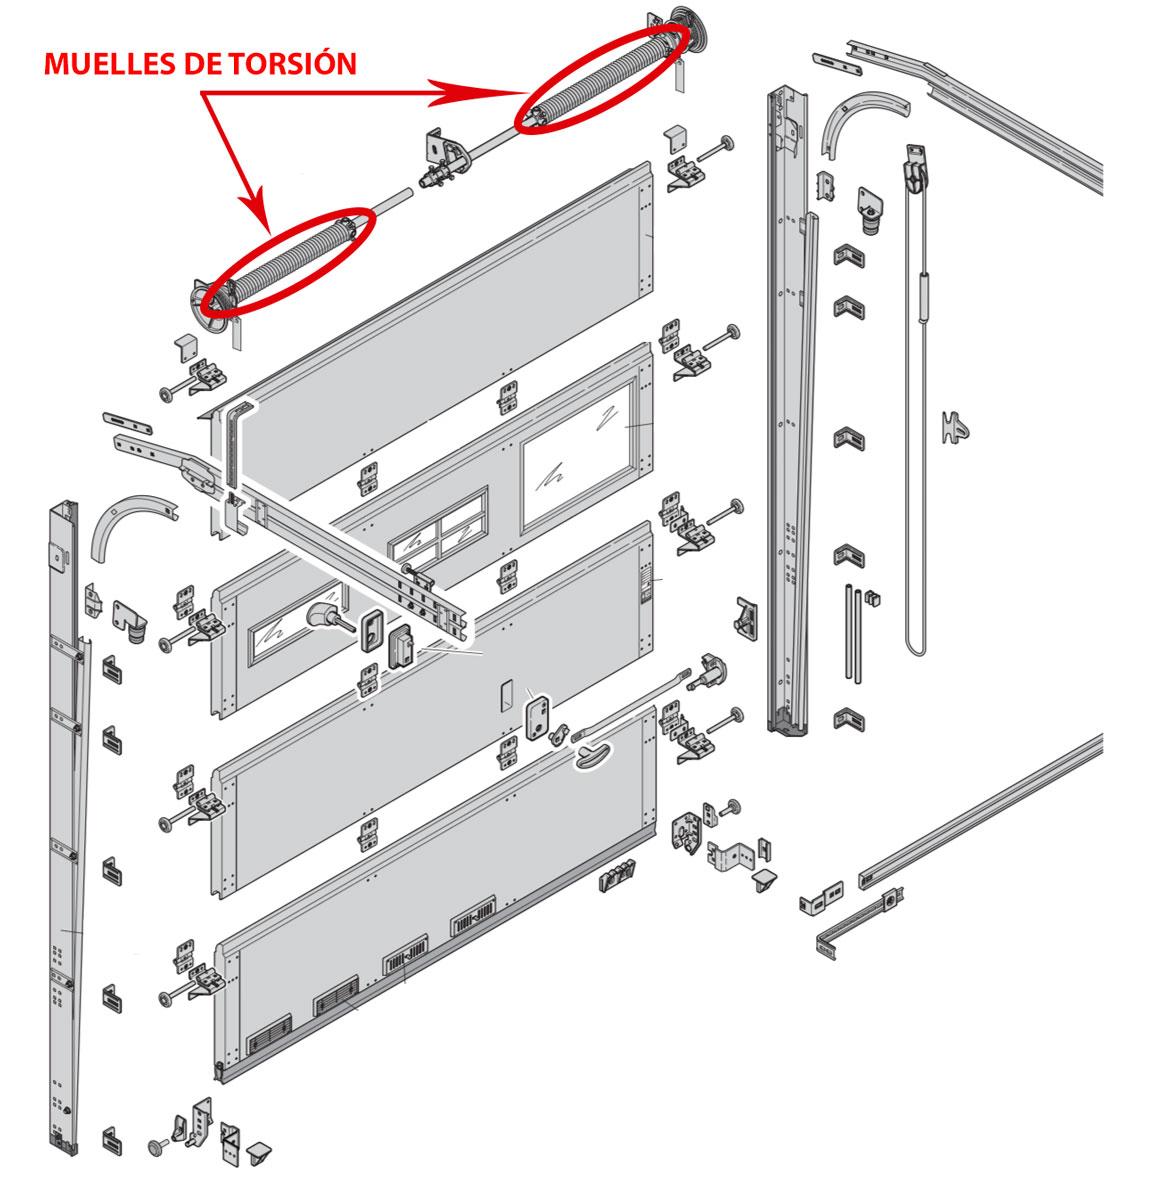 Puerta de garaje hörmann